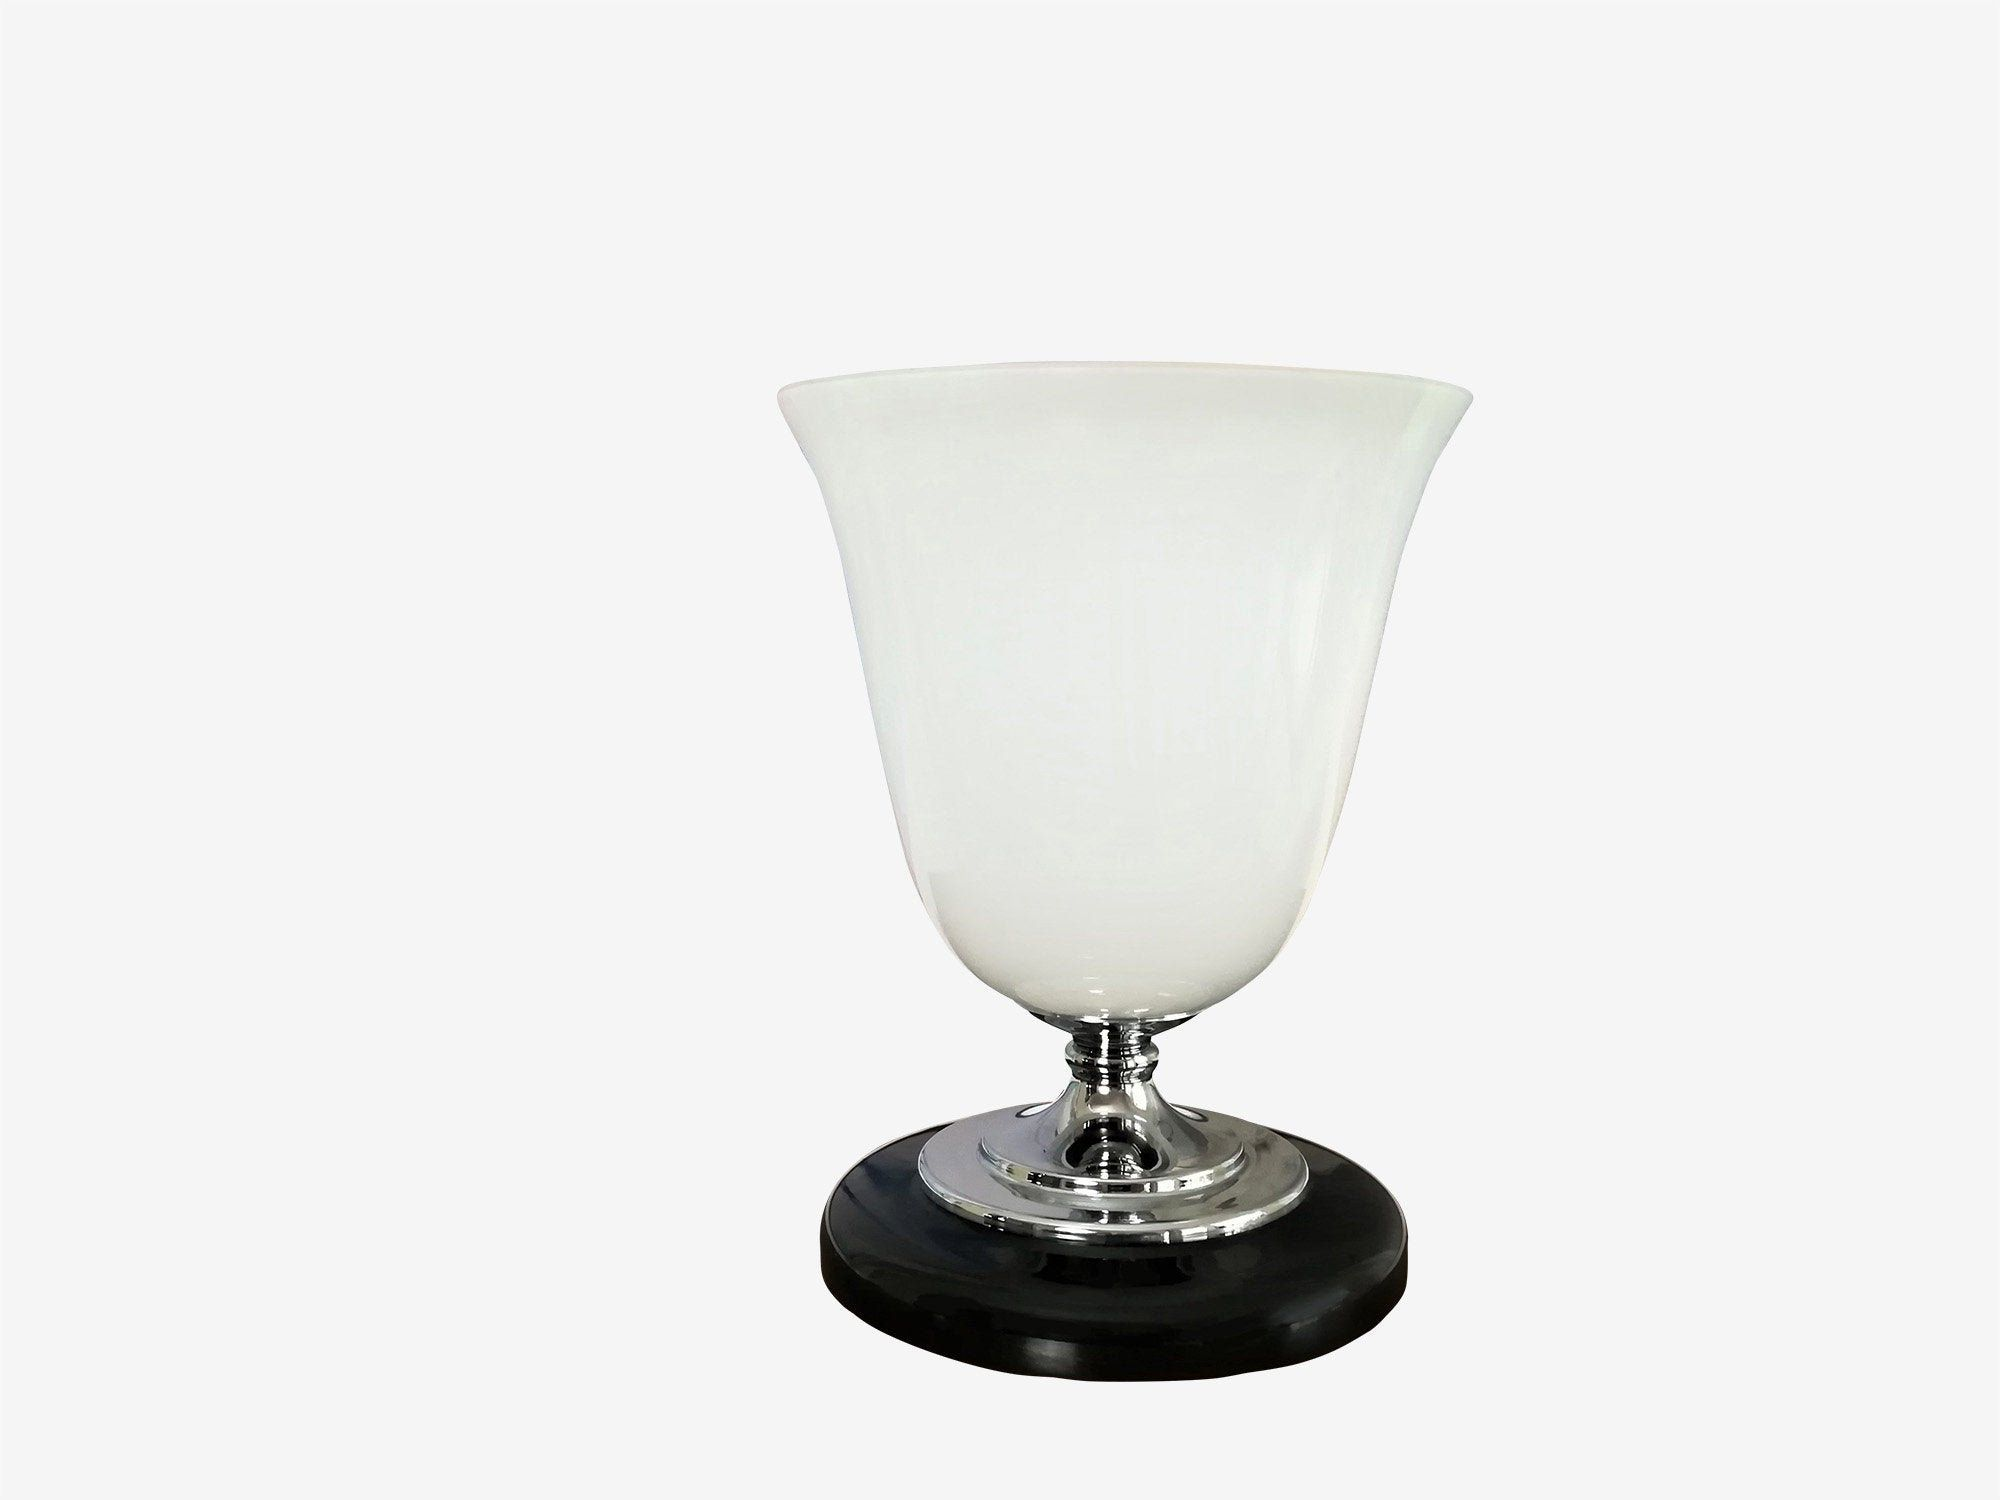 Mazda Tischlampe Mit Weissem Schirm Lampe Fur Kommode Nachttischlampe Seidbordlampe Mazdalampe Xs In 2020 Bedside Lamp Lamp Table Lamp